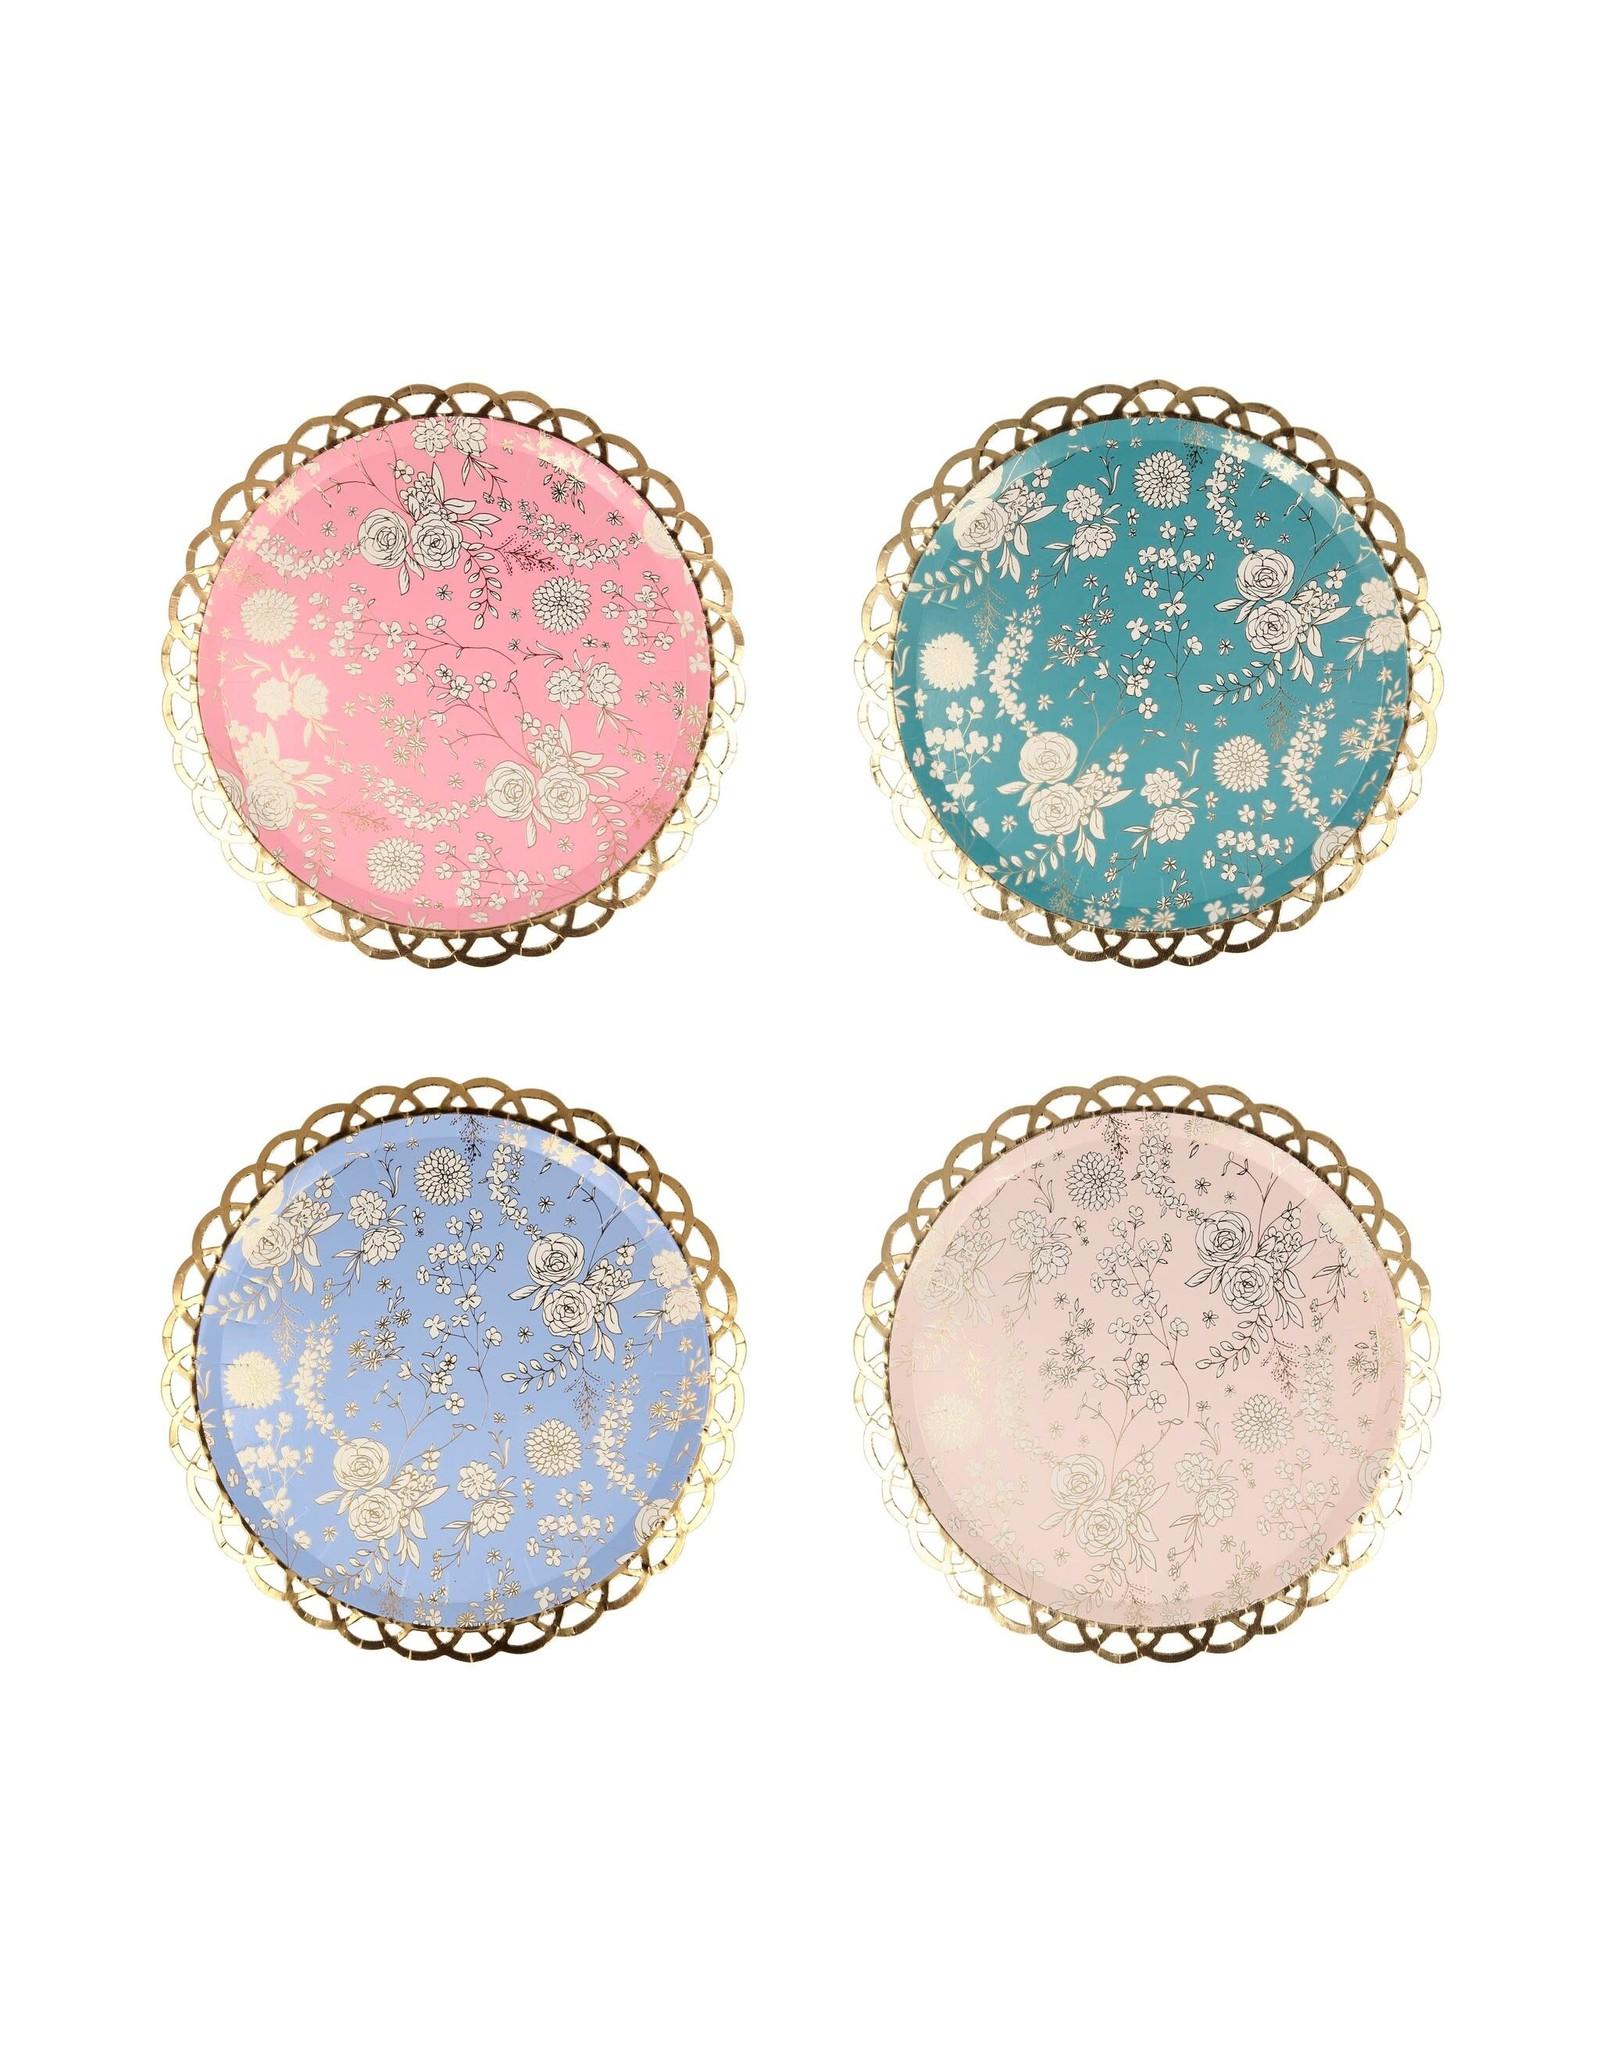 Meri Meri English Garden Lace Side Plates